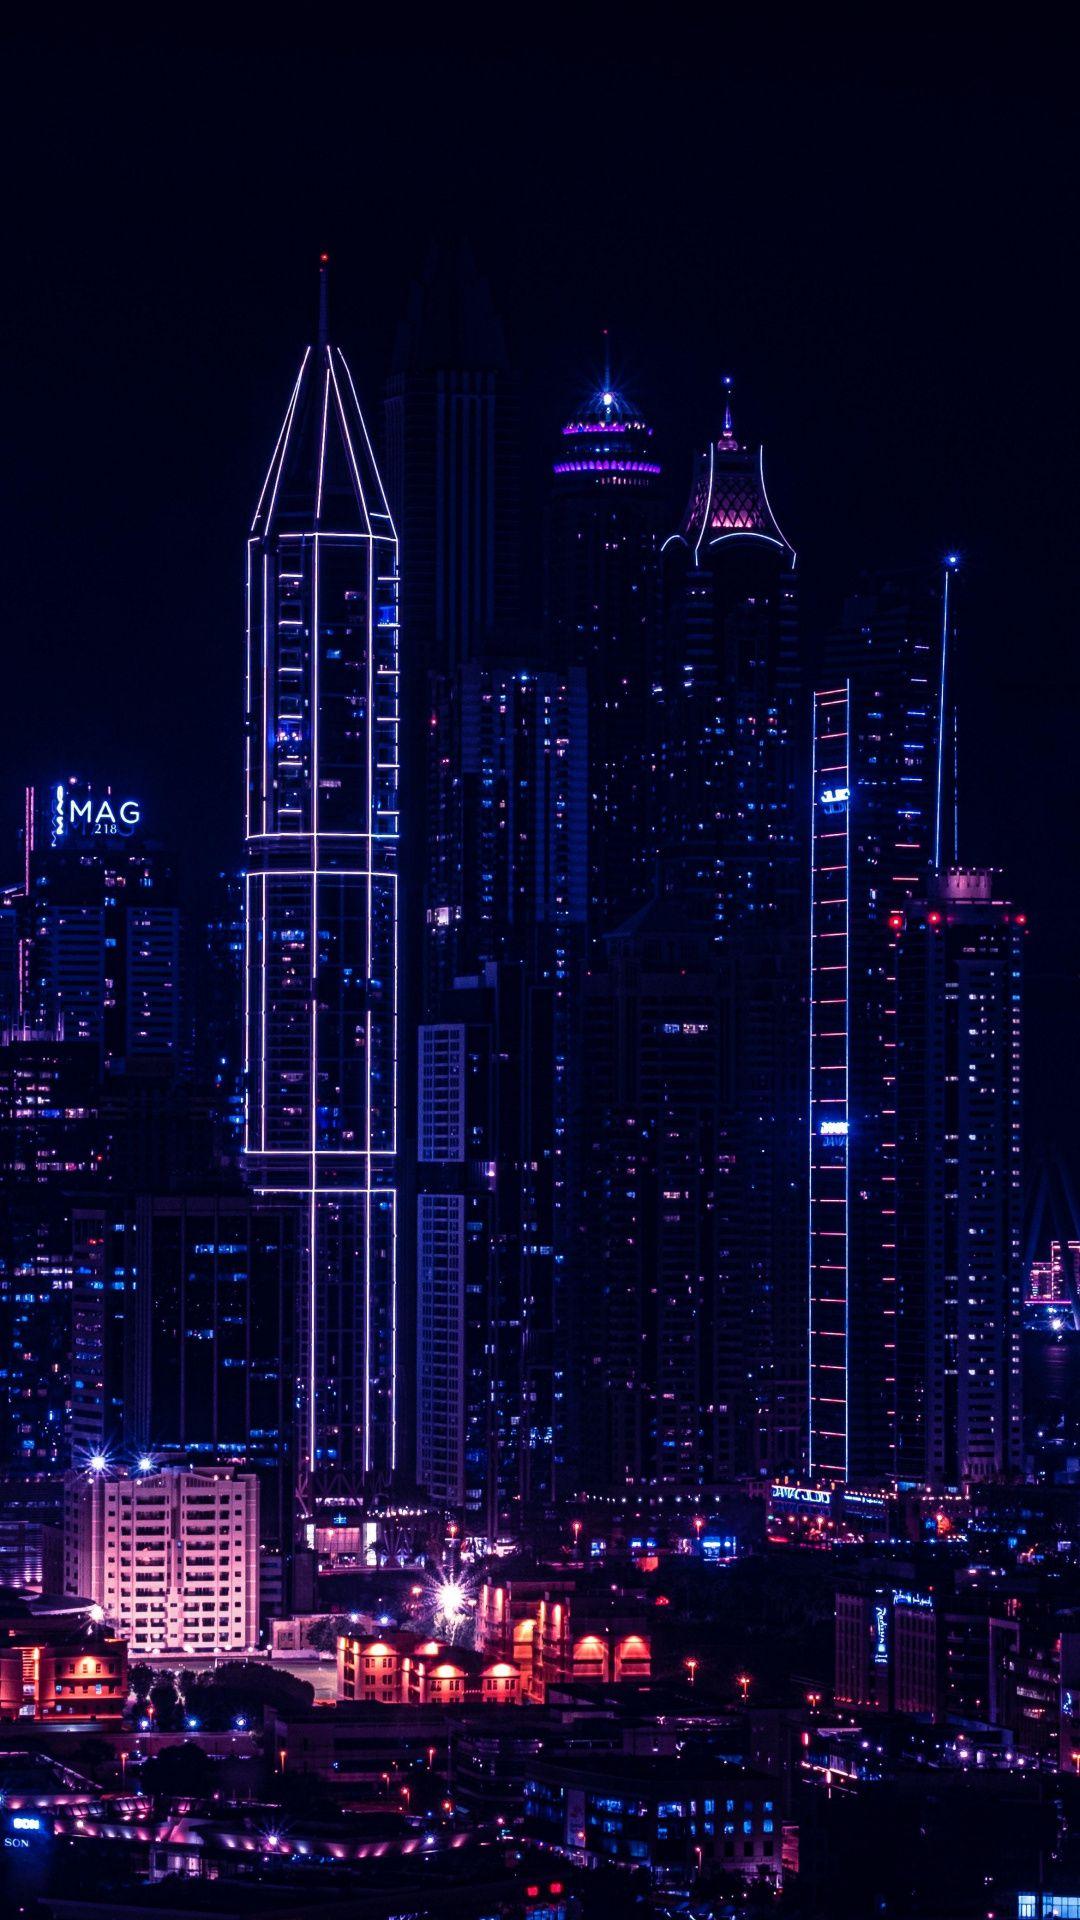 Night Light Wallpaper : night, light, wallpaper, 1080x1920, City,, Night,, Lights, Buildings,, Cityscape, Wallpaper, Wallpaper,, Aesthetic